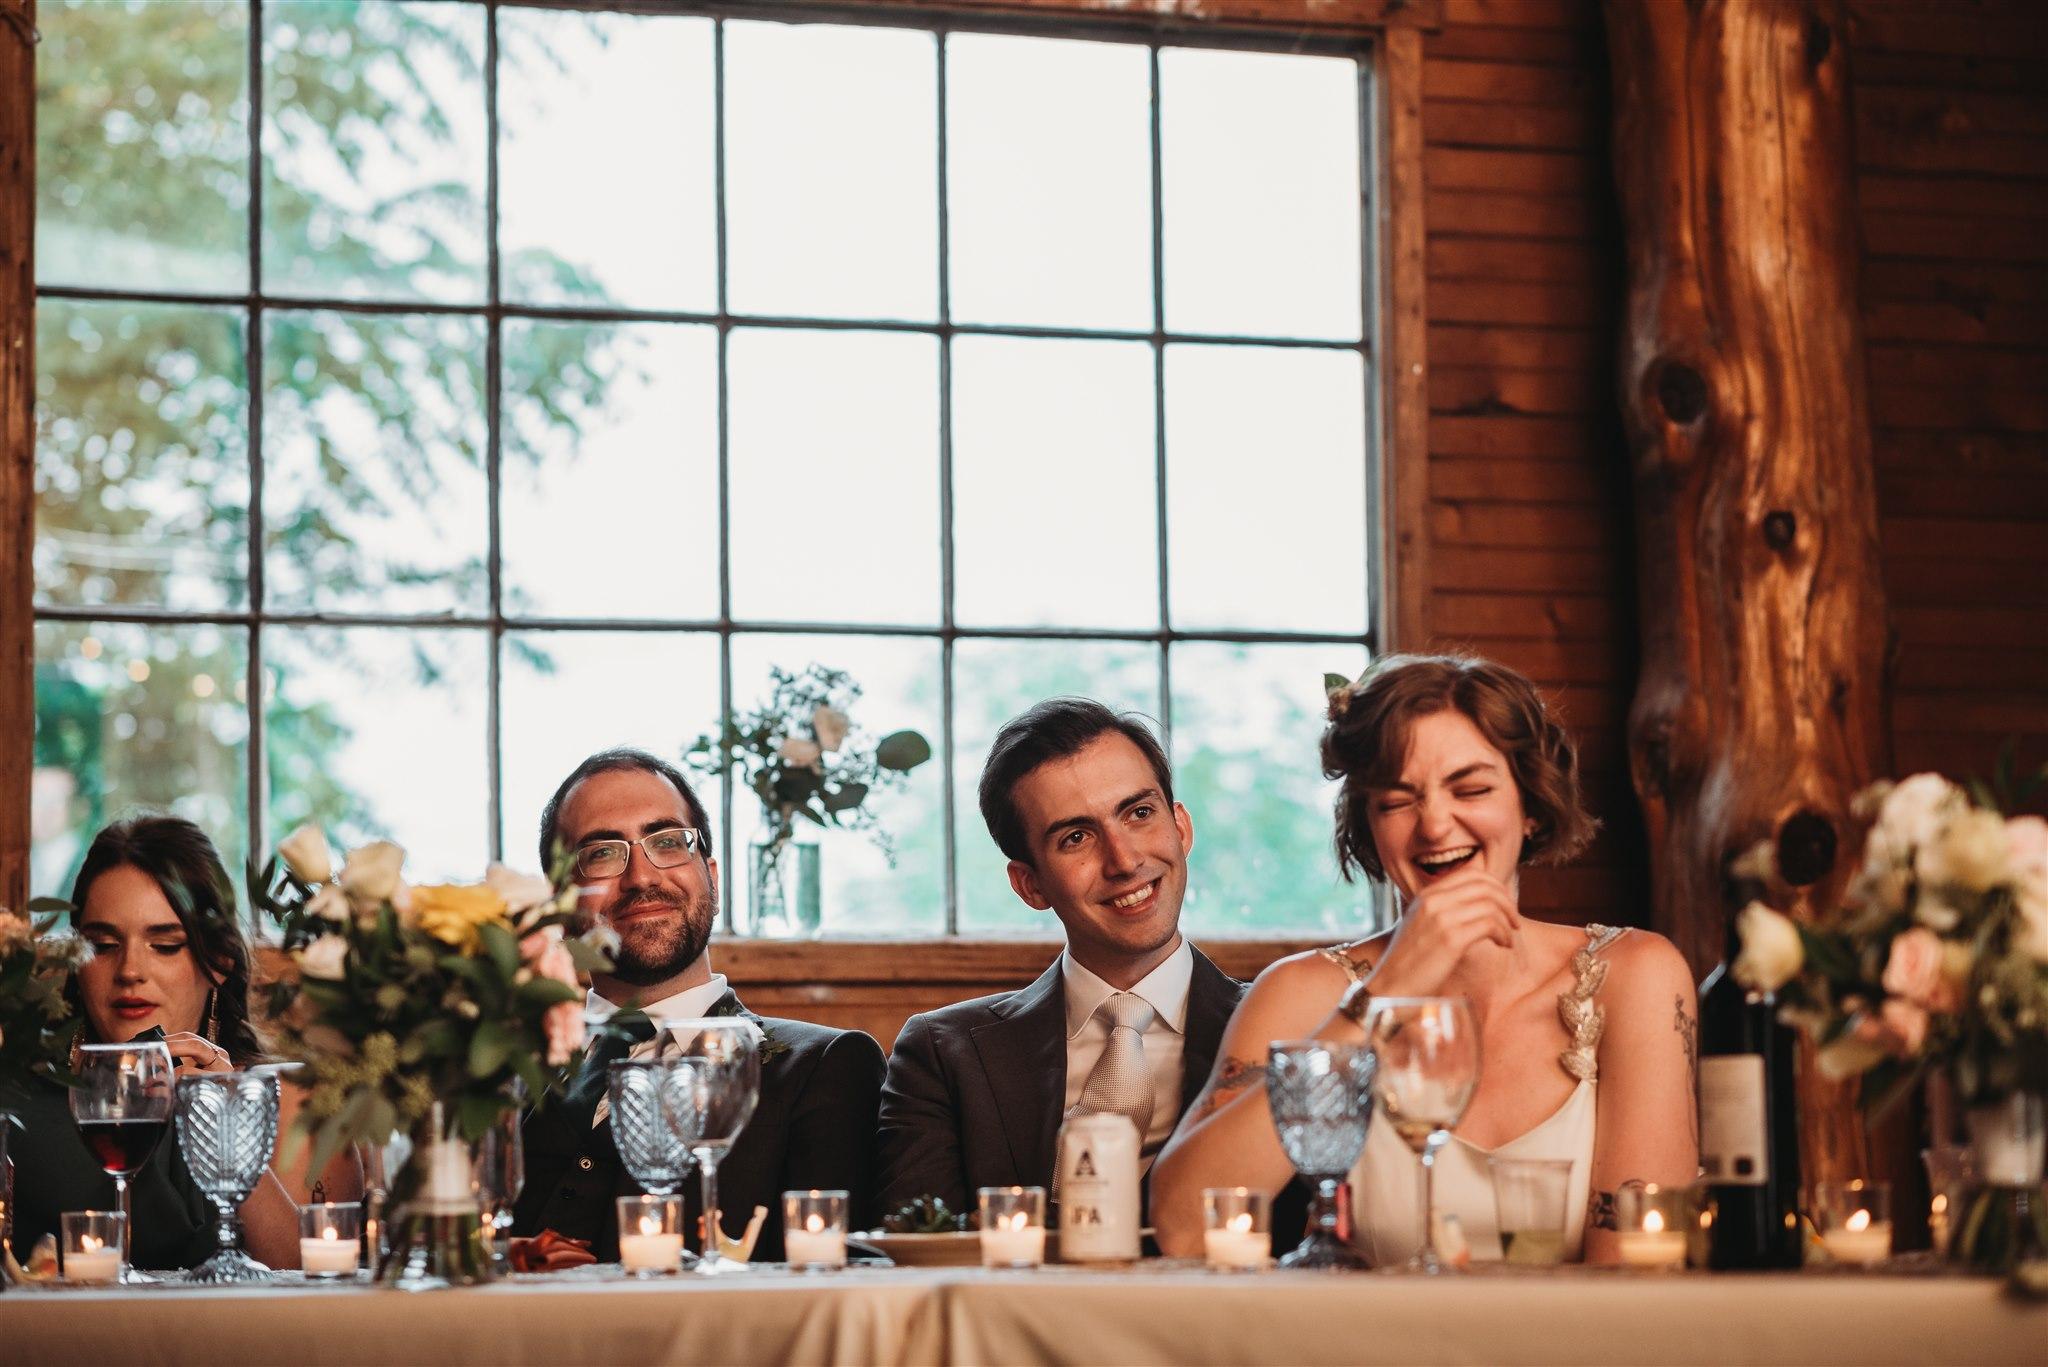 fanshawe conservation area wedding photos 494 1 - Watson Porter Pavillion Wedding